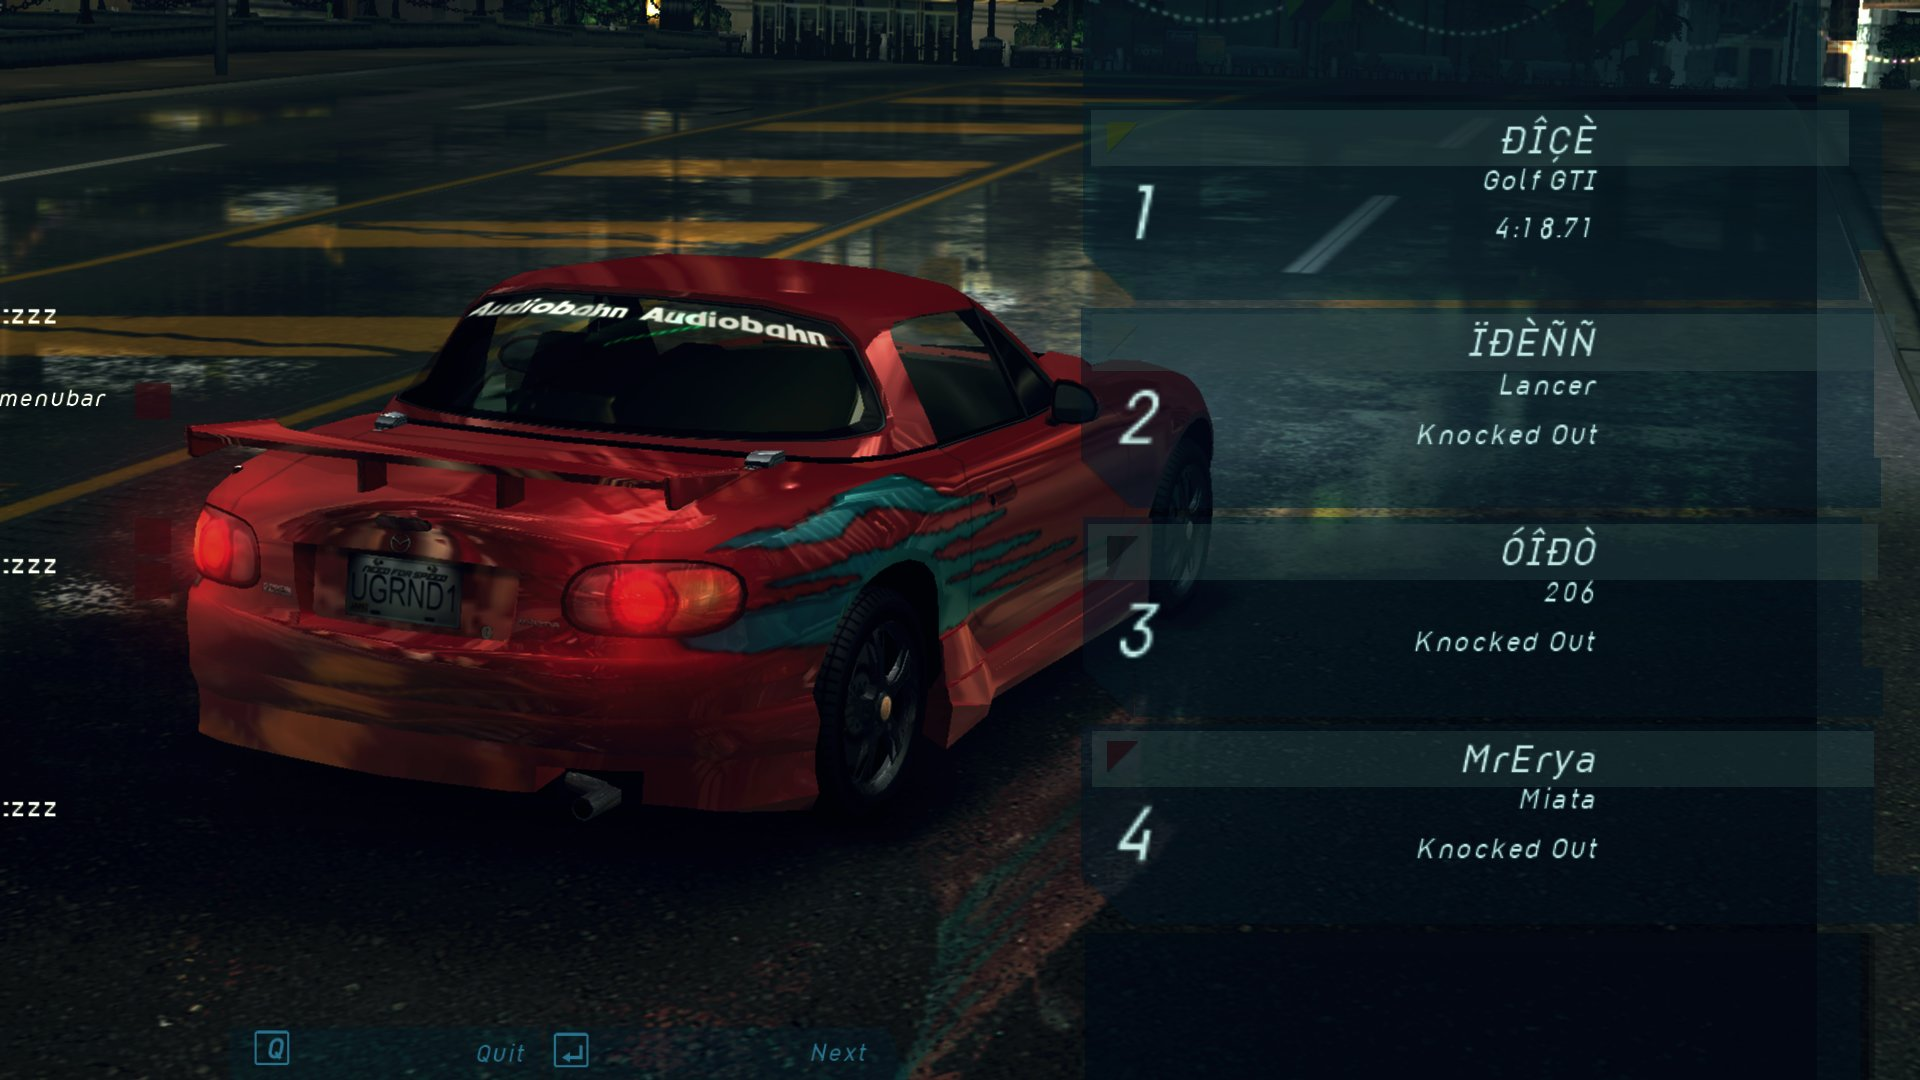 NFS: Underground: Redux Mod для Другие игры - Скриншот 1